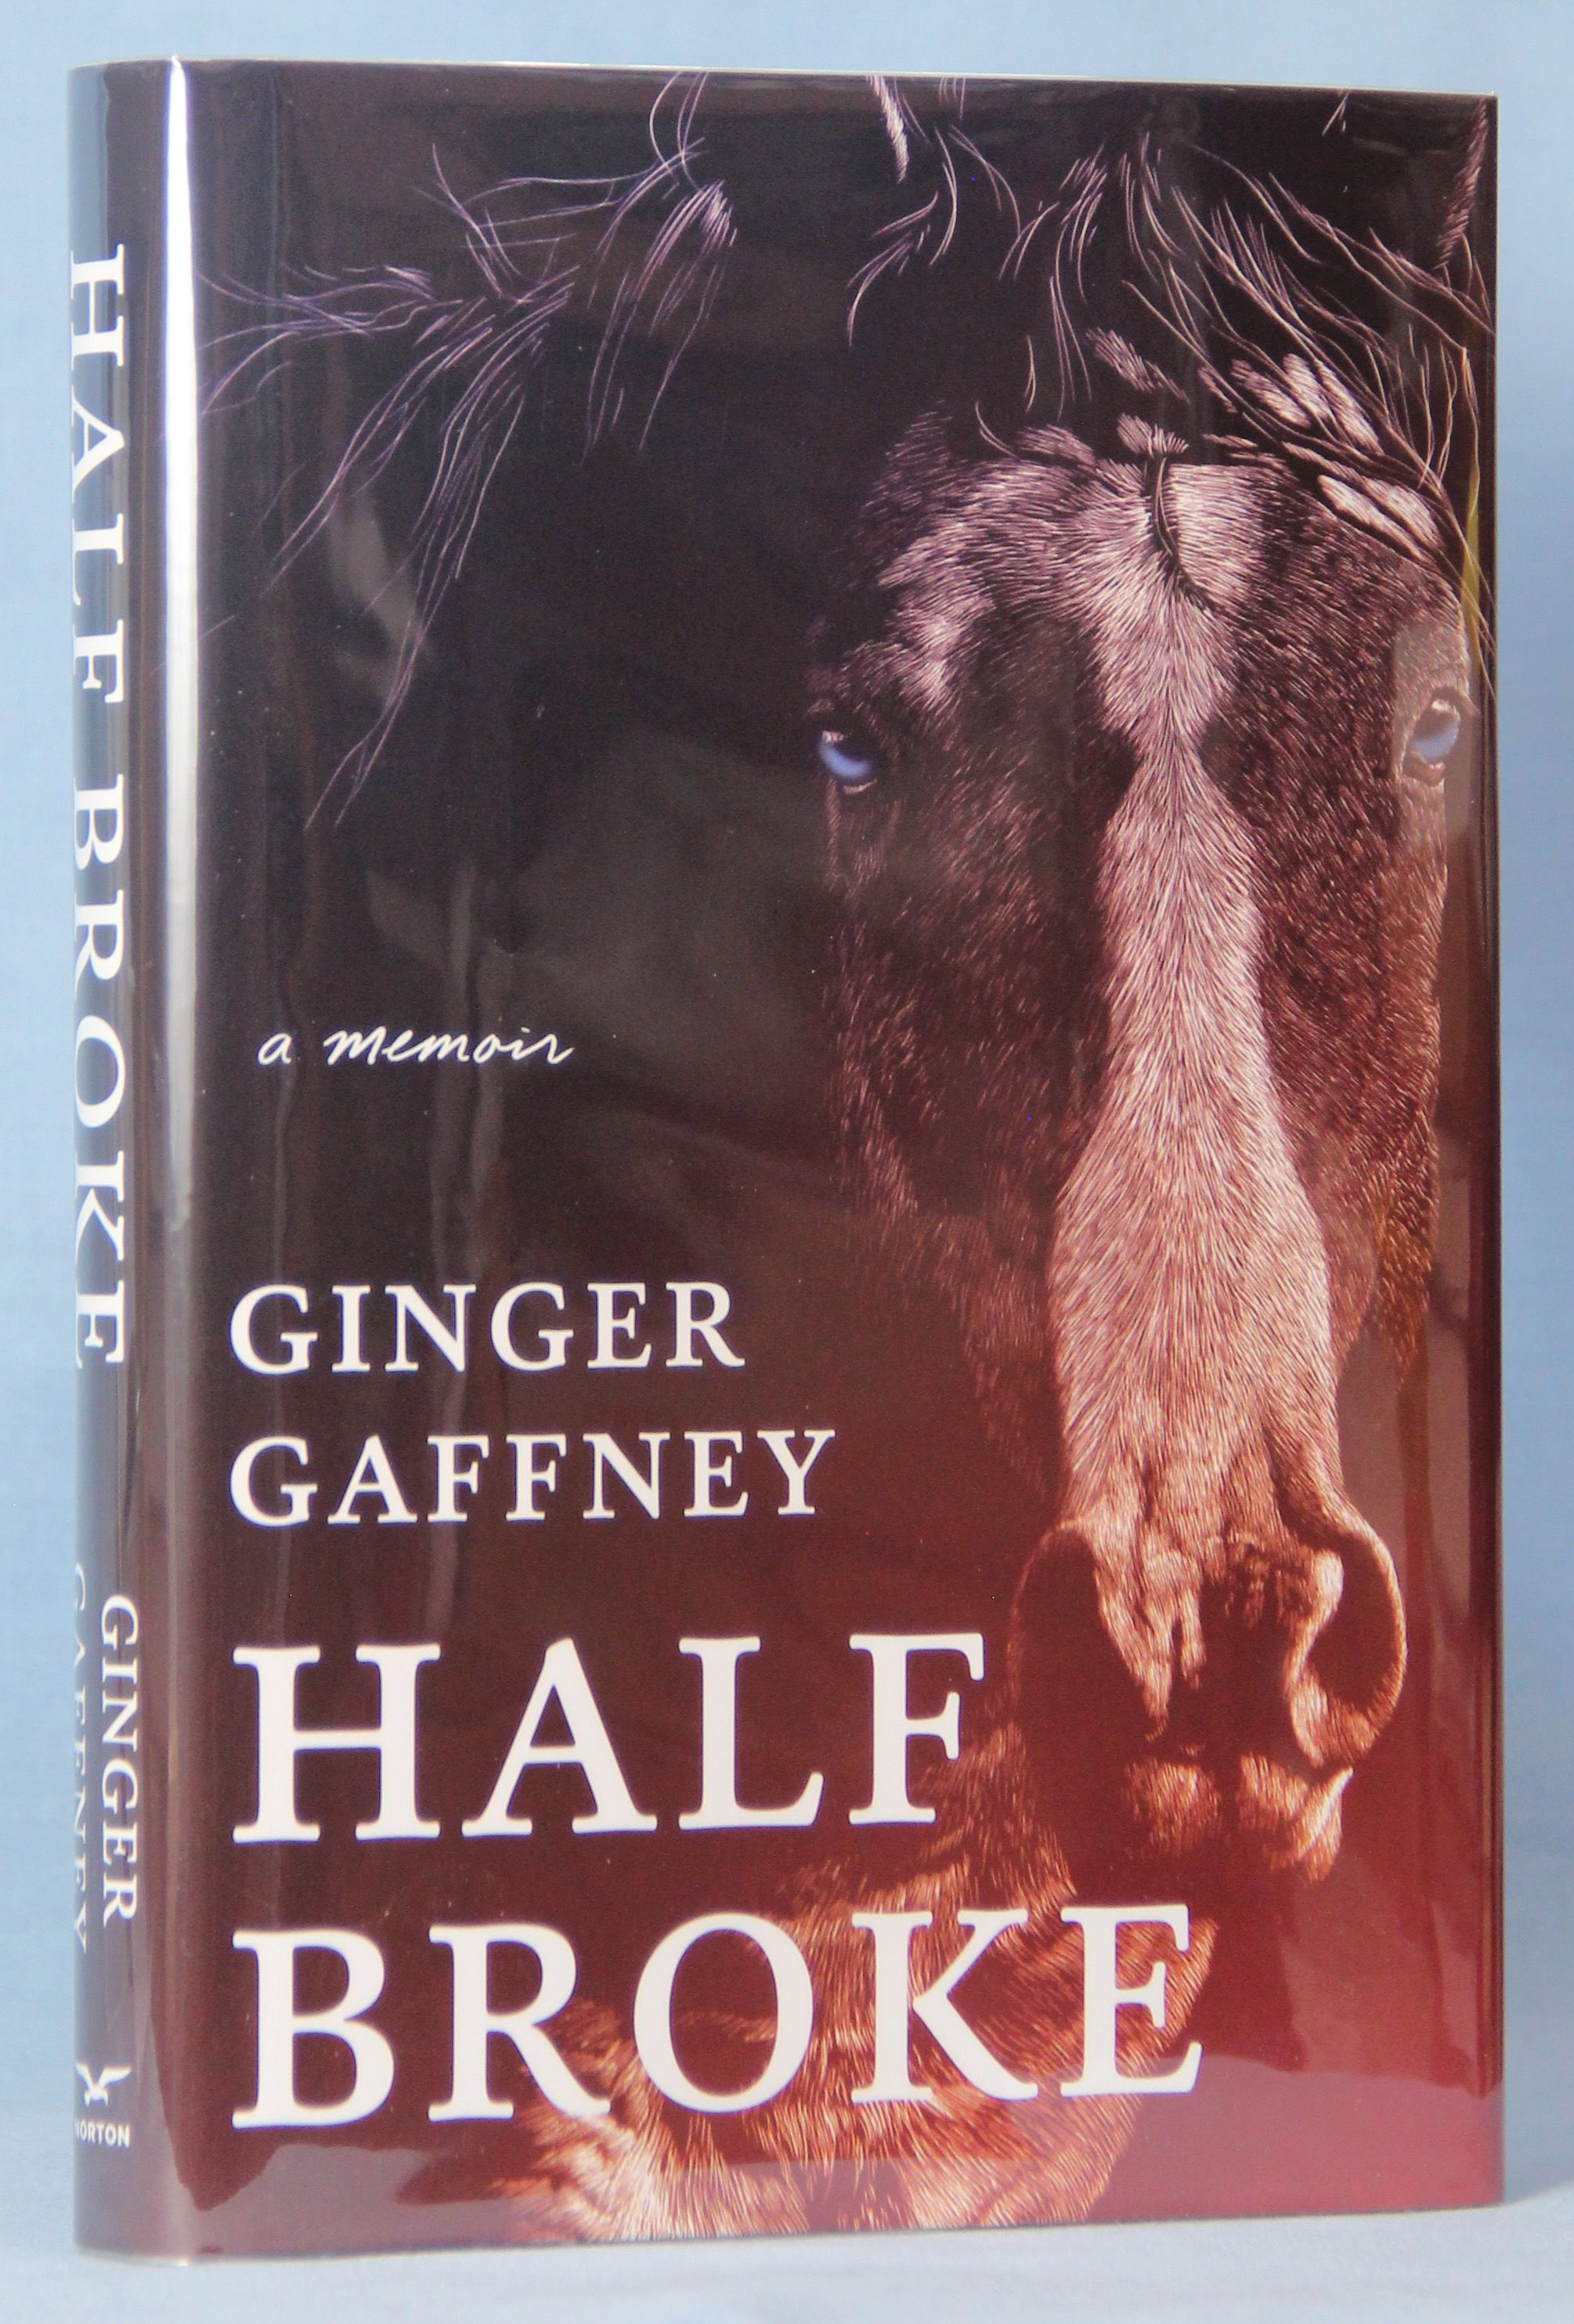 Image for Half Broke: A Memoir (Signed)